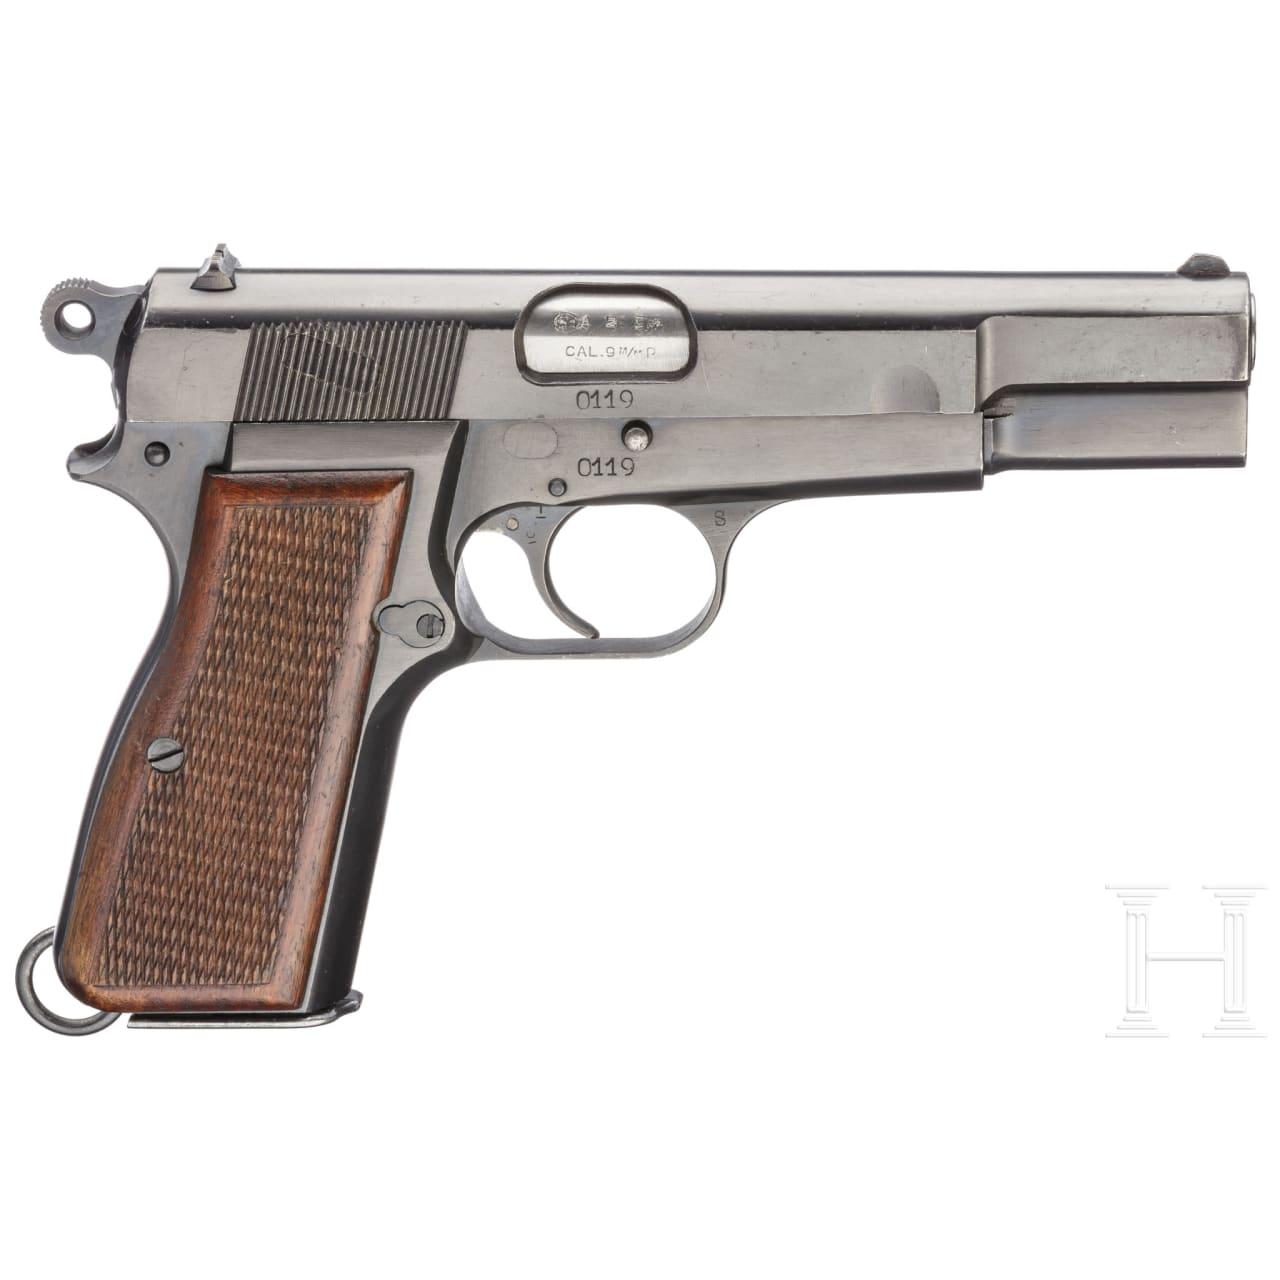 FN HP Mod. 35 (m/46 DK), im Karton